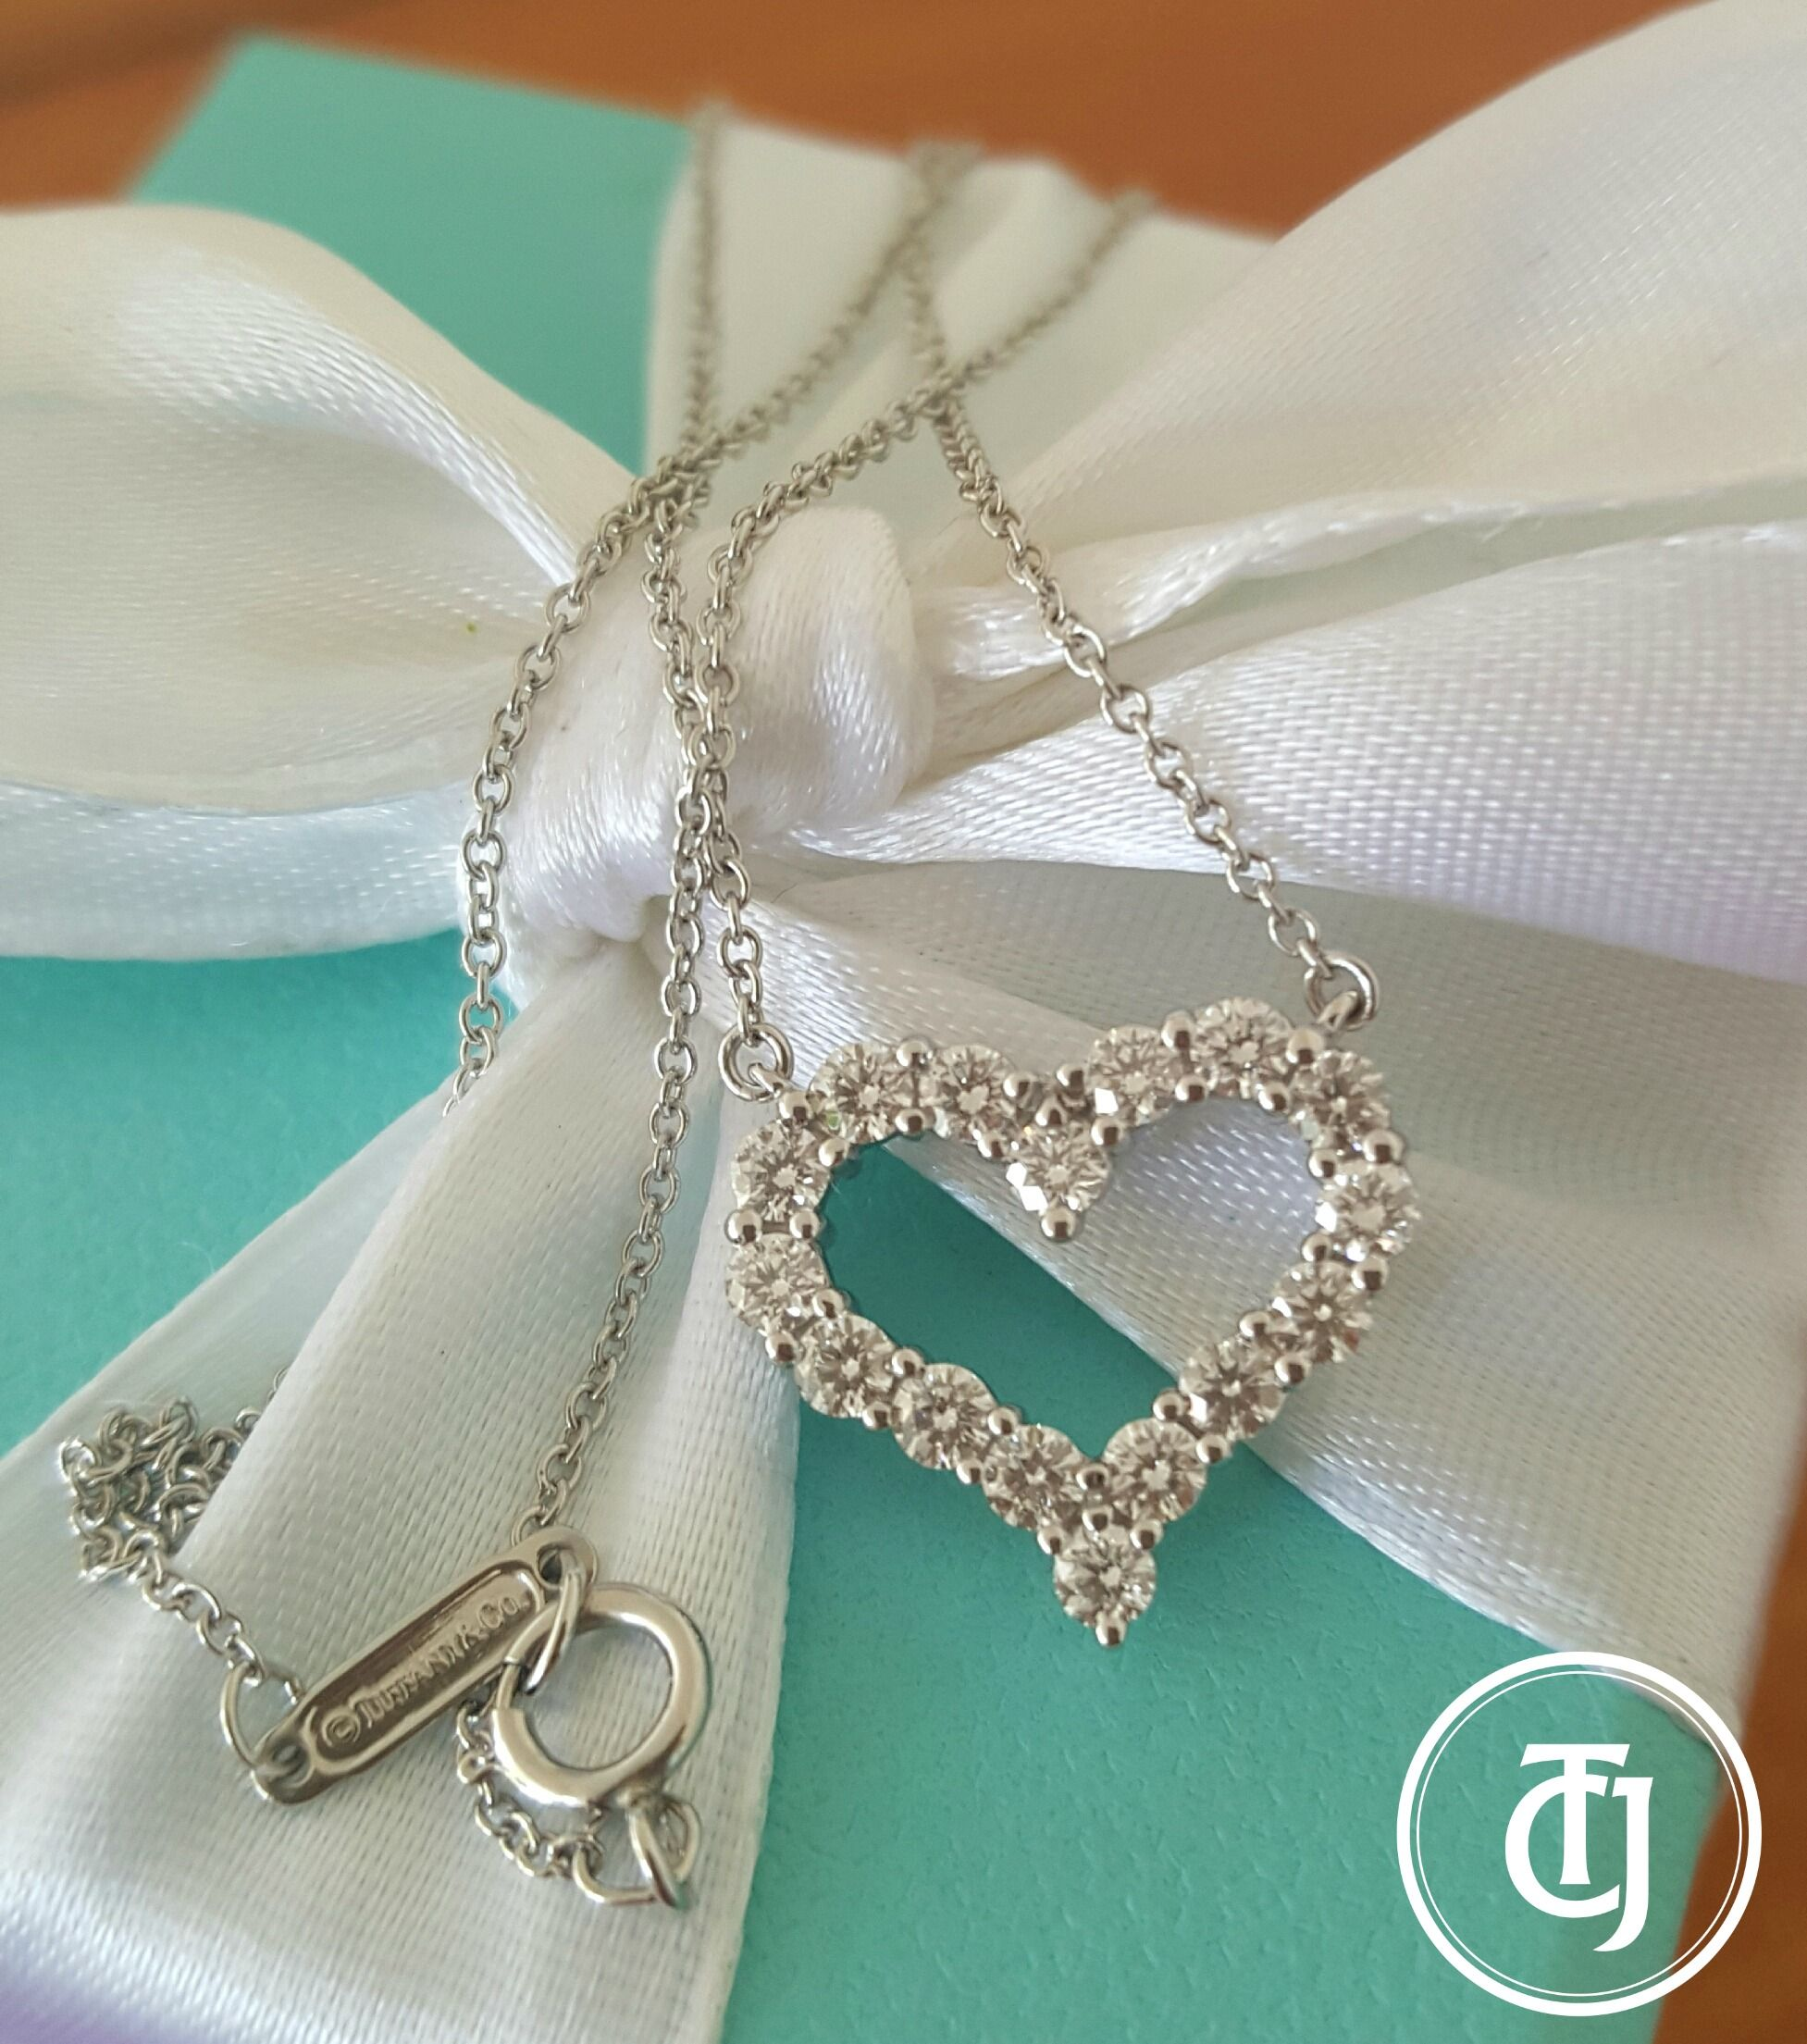 Tiffany co diamond heart pendant size small tiffanyandco tiffany co diamond heart pendant size small tiffanyandco diamond necklace aloadofball Image collections